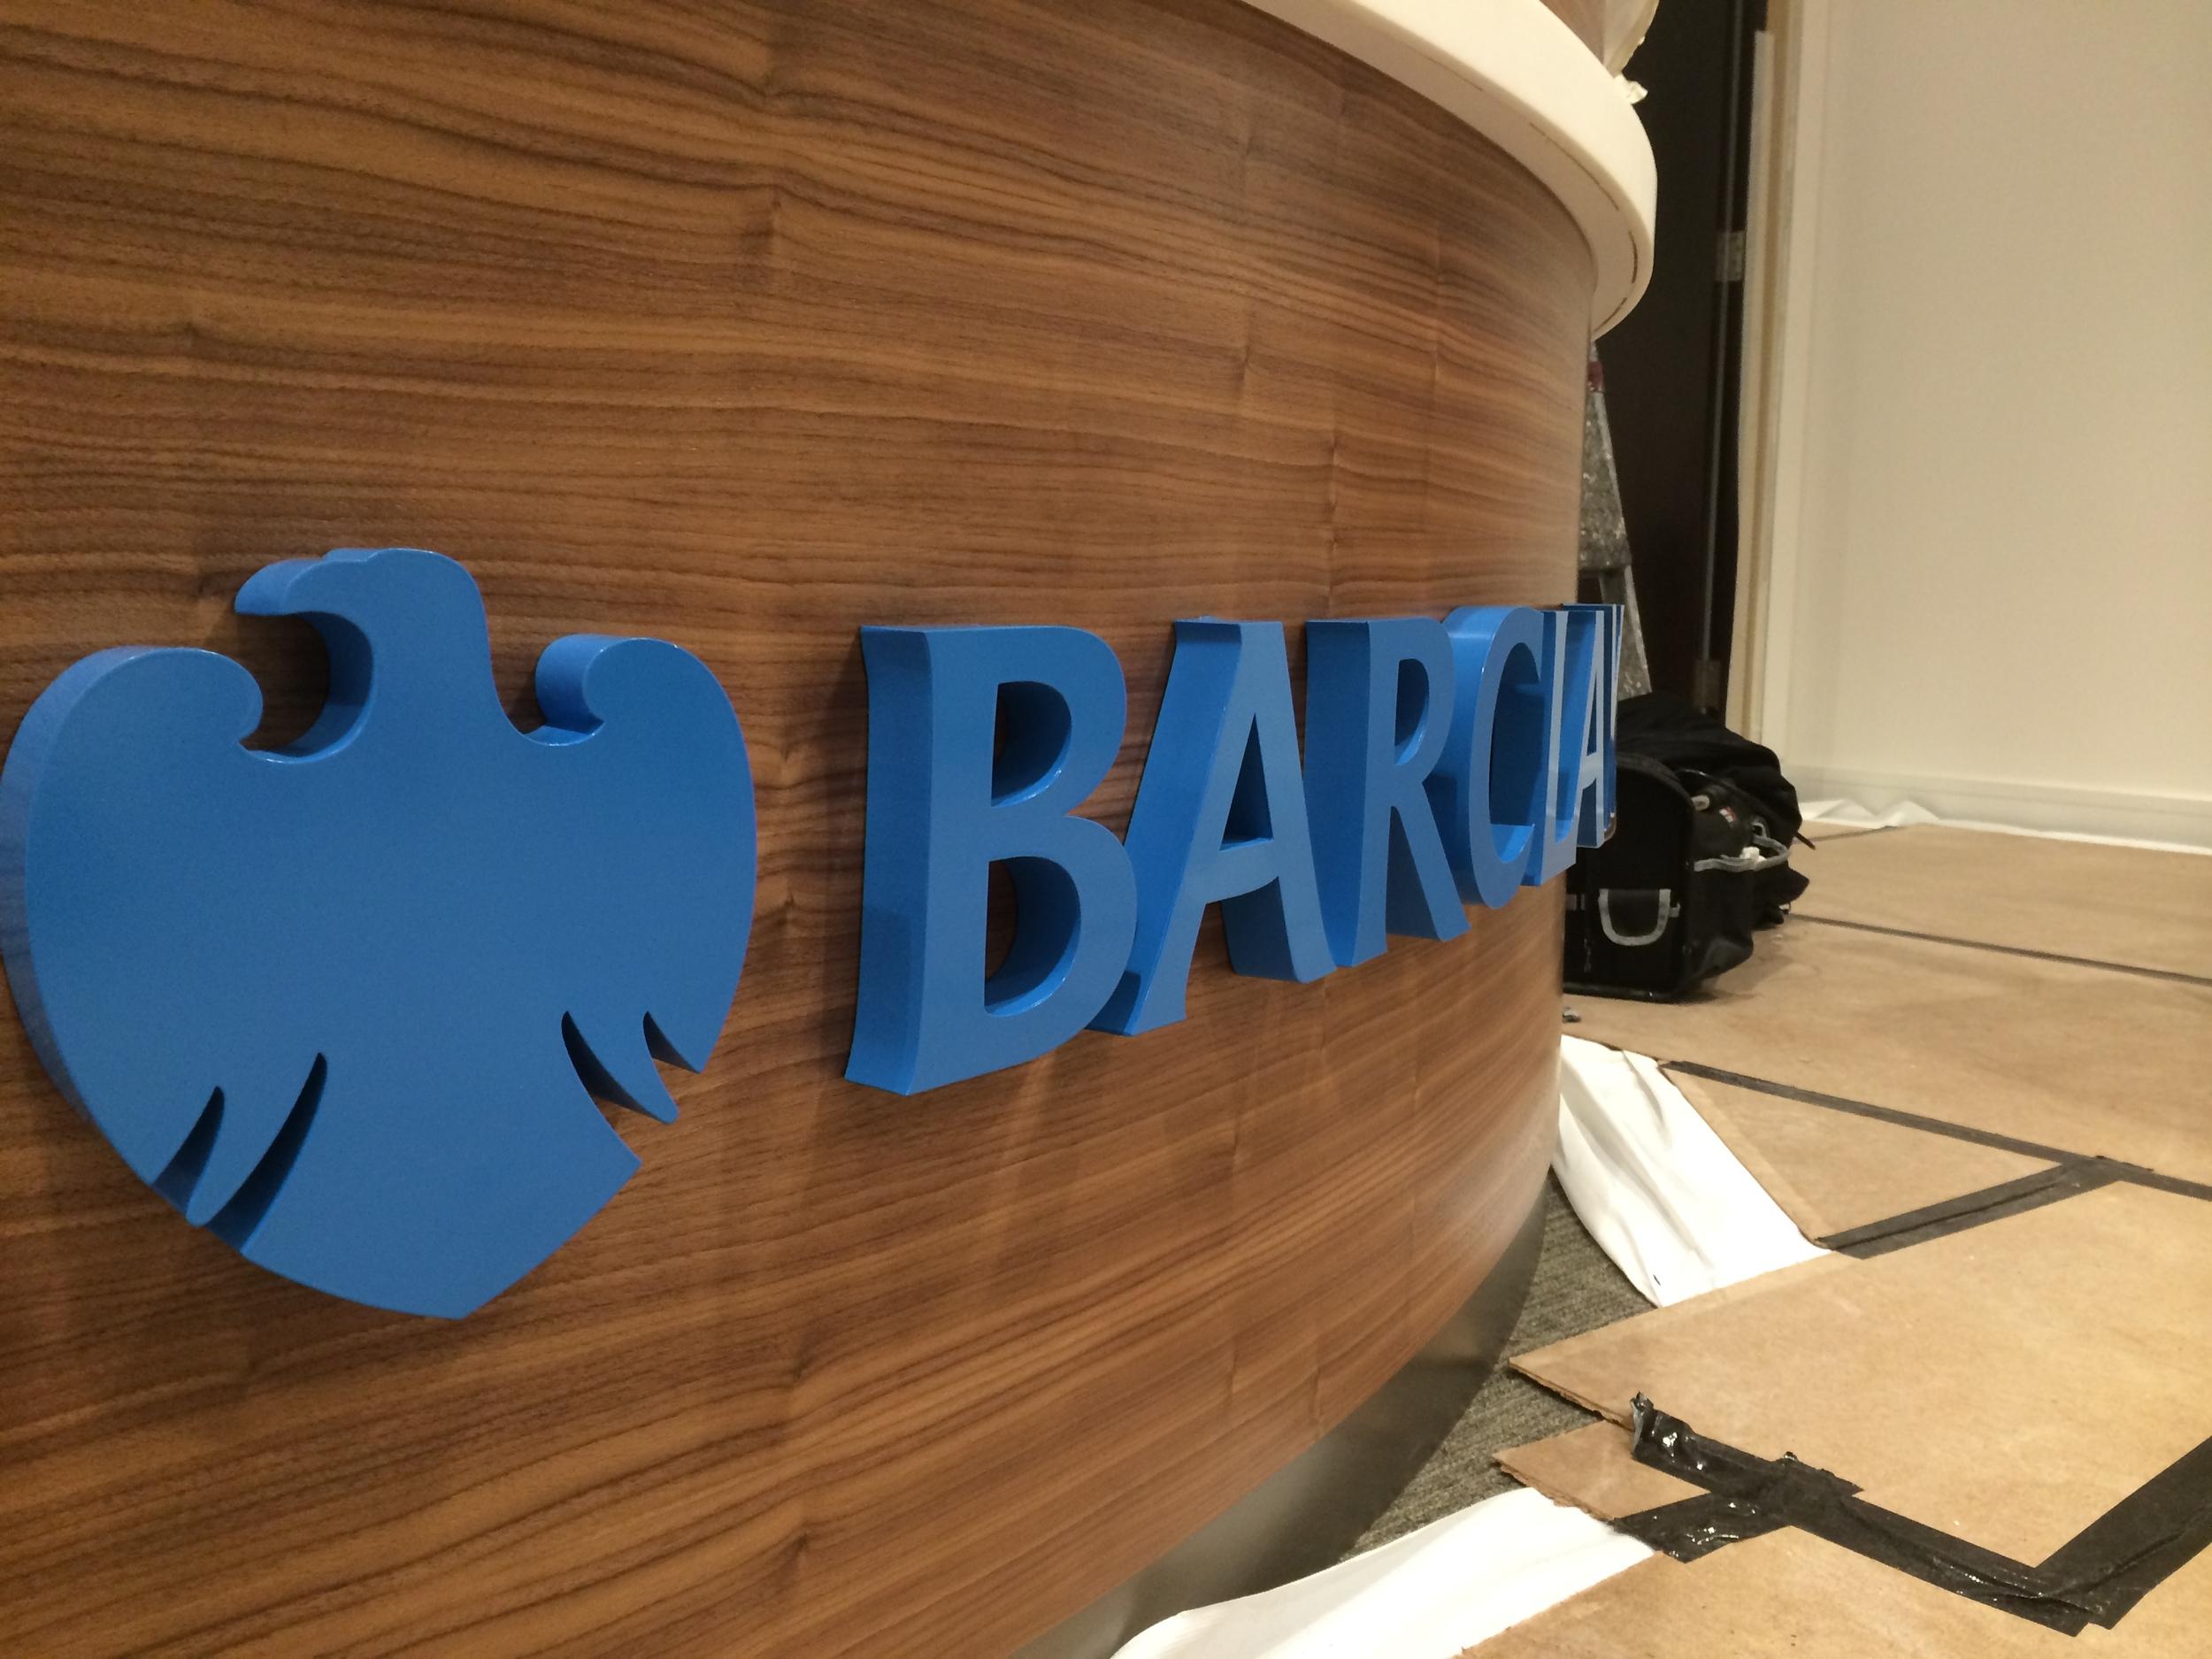 barclays built up letters 3.JPG